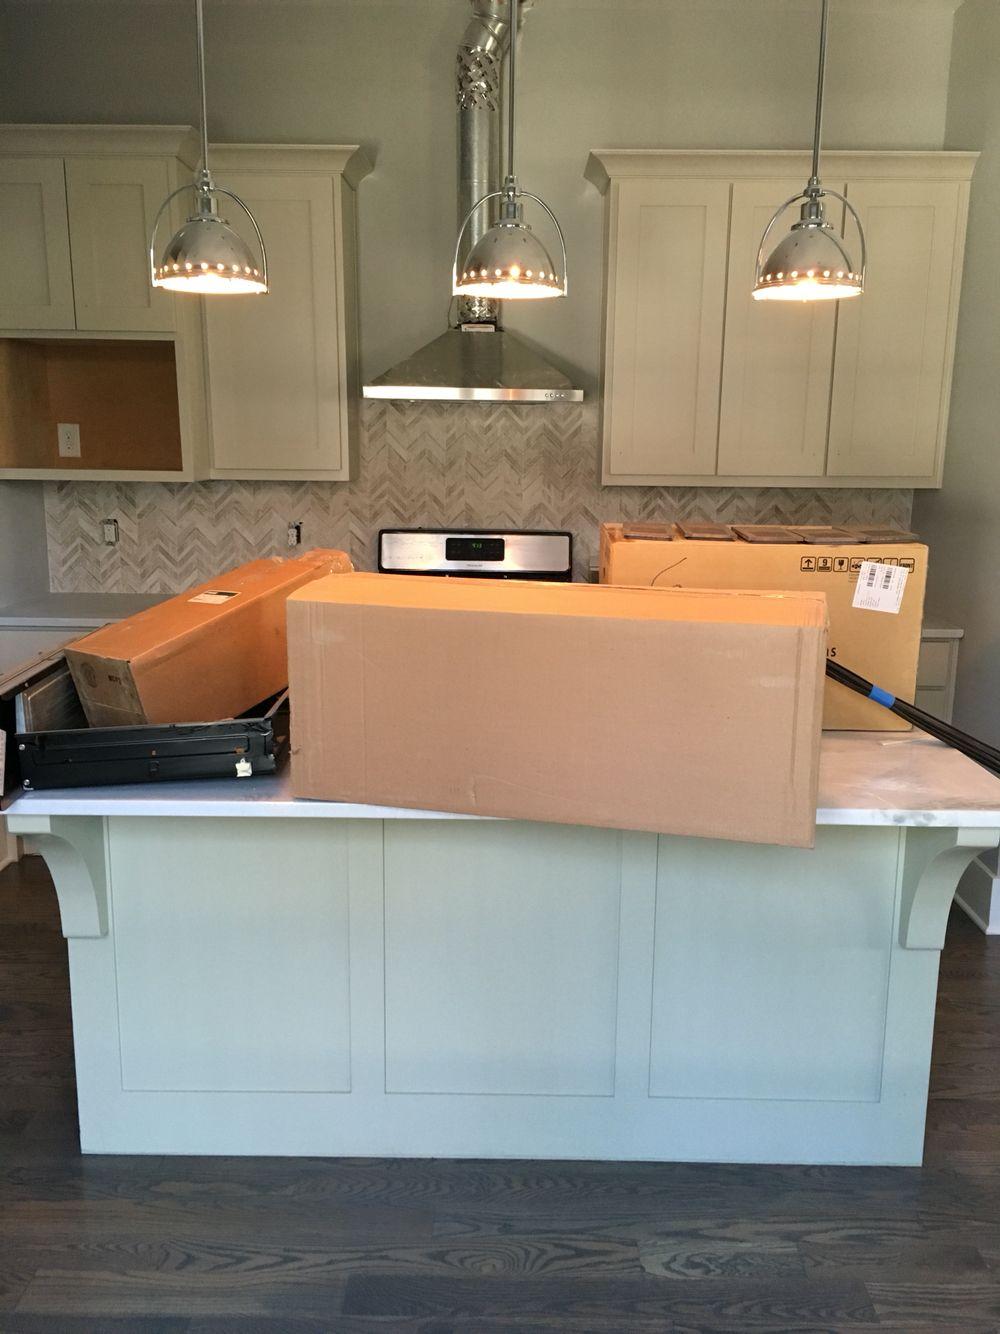 Warm Kitchen With Limestone Chevron Backsplash, Chrome Fixtures And Carrara  Countertops. Superior Development,